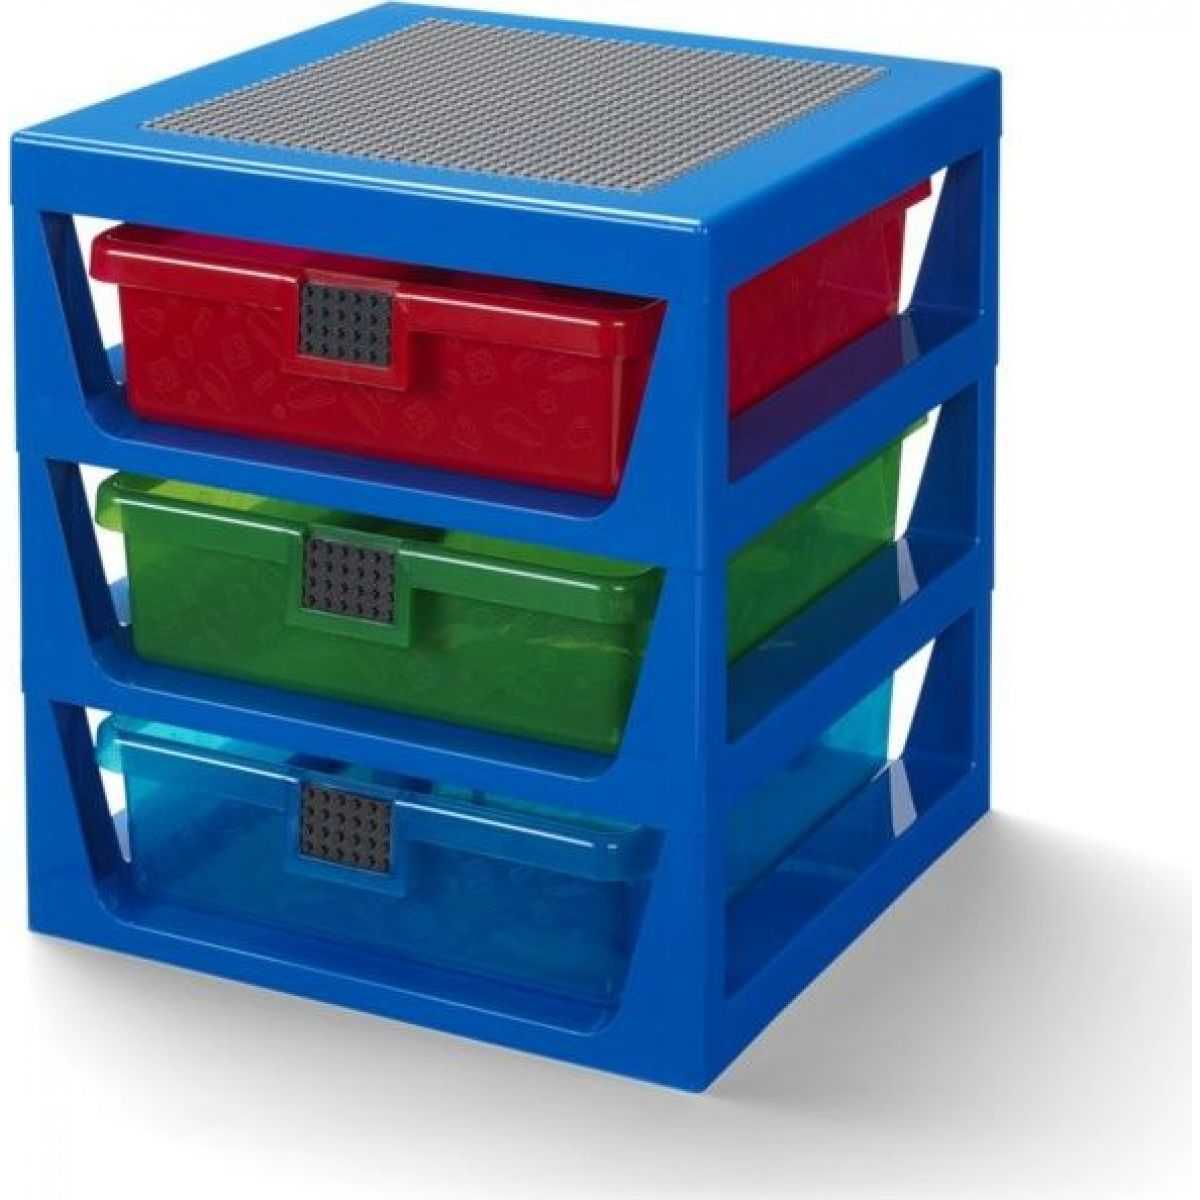 LEGO® organizér se třemi zásuvkami - modrá